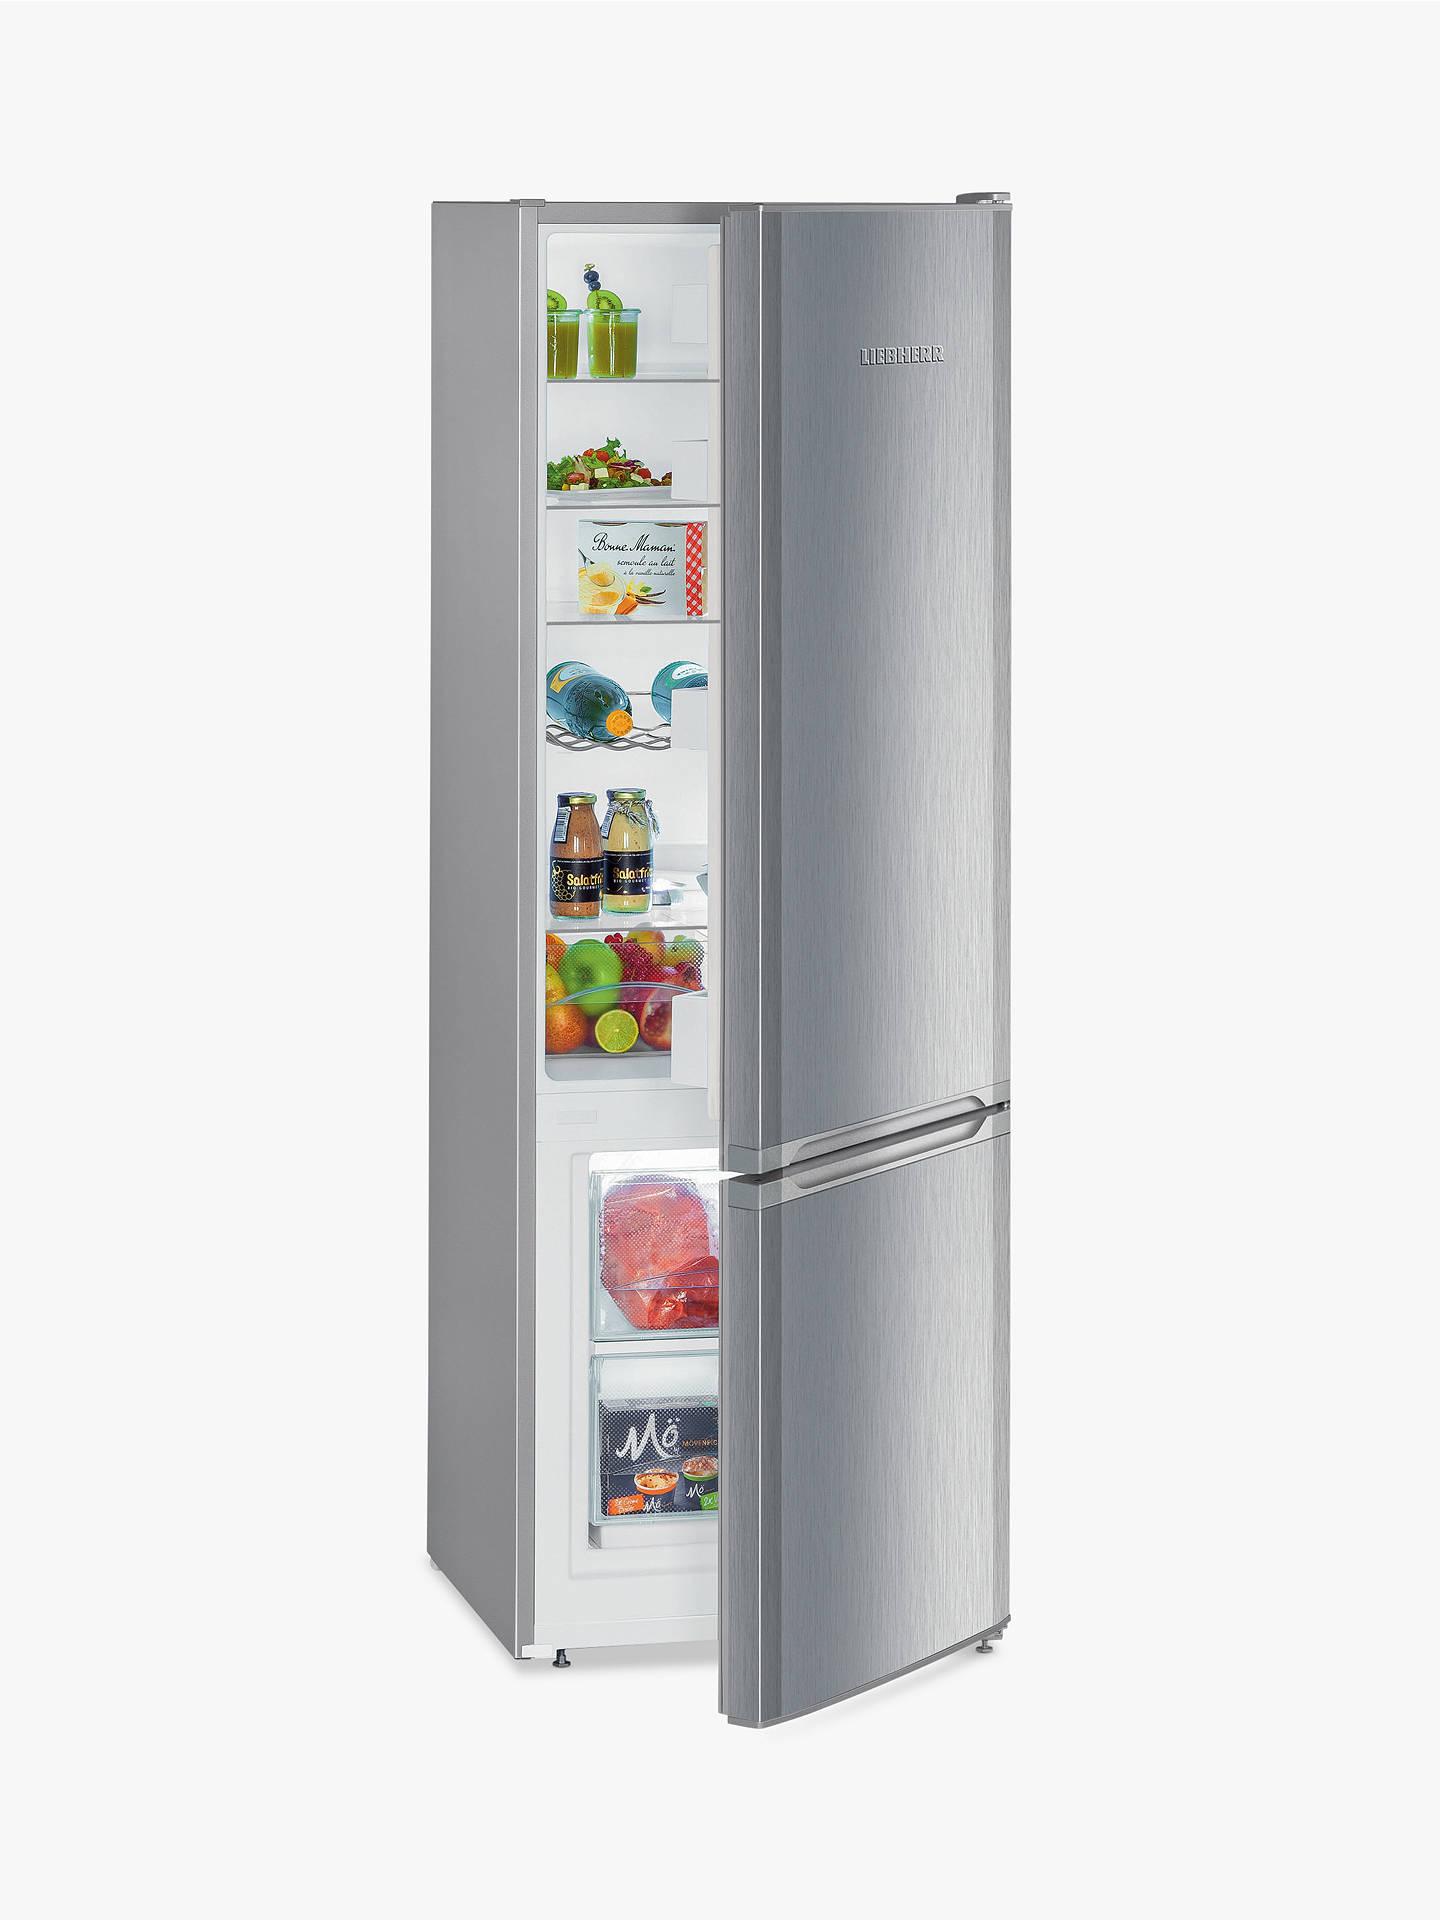 Liebherr CUEL2831 Freestanding Fridge Freezer, A++ Energy Rating, 55cm  Wide, Stainless Steel